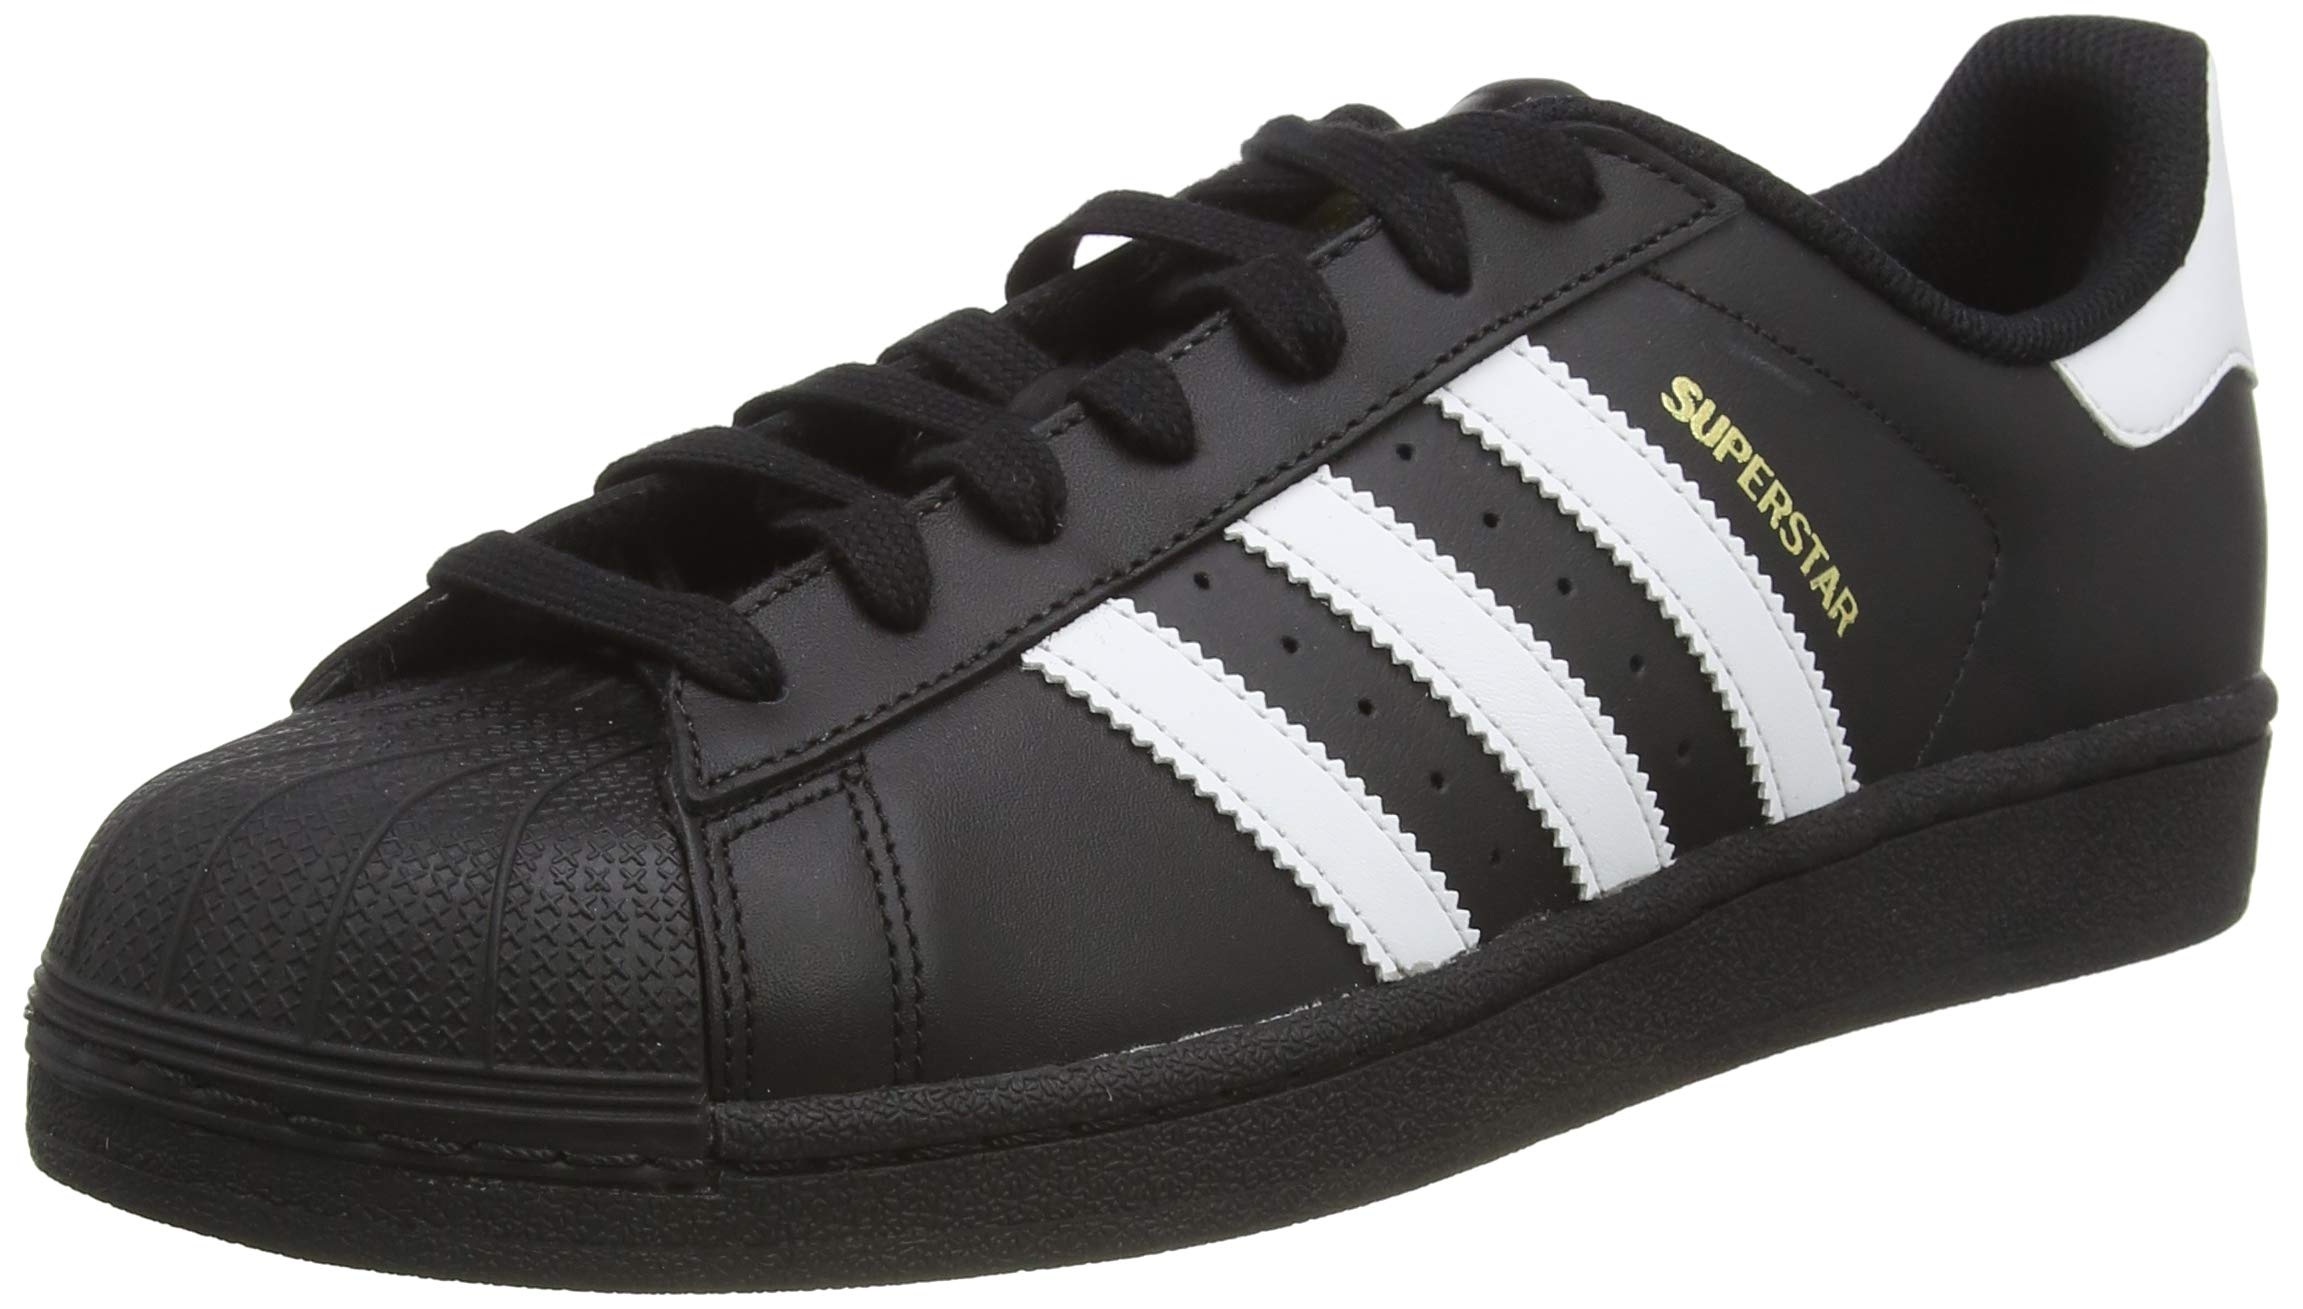 Adidas Superstar Foundation CF PS Chaussure Adidas